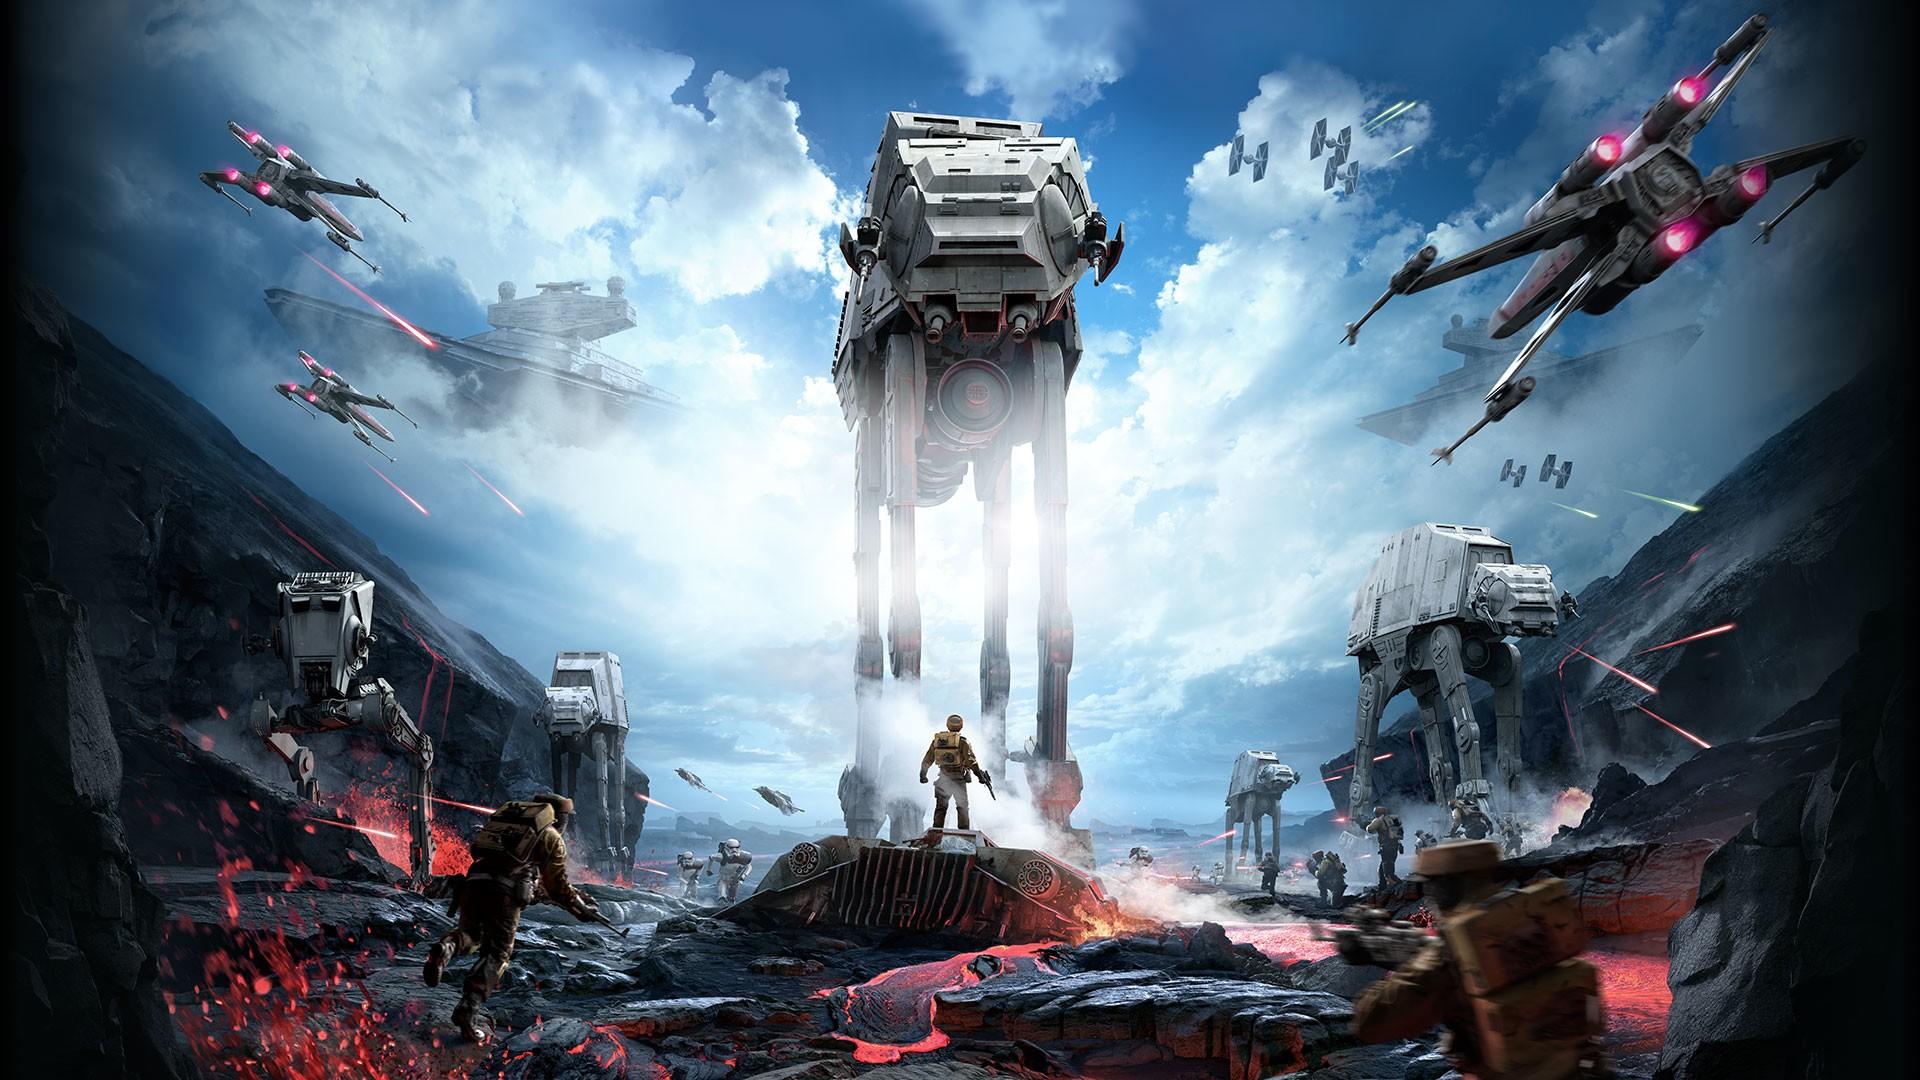 star wars battlefront wallpaper ·① download free stunning full hd